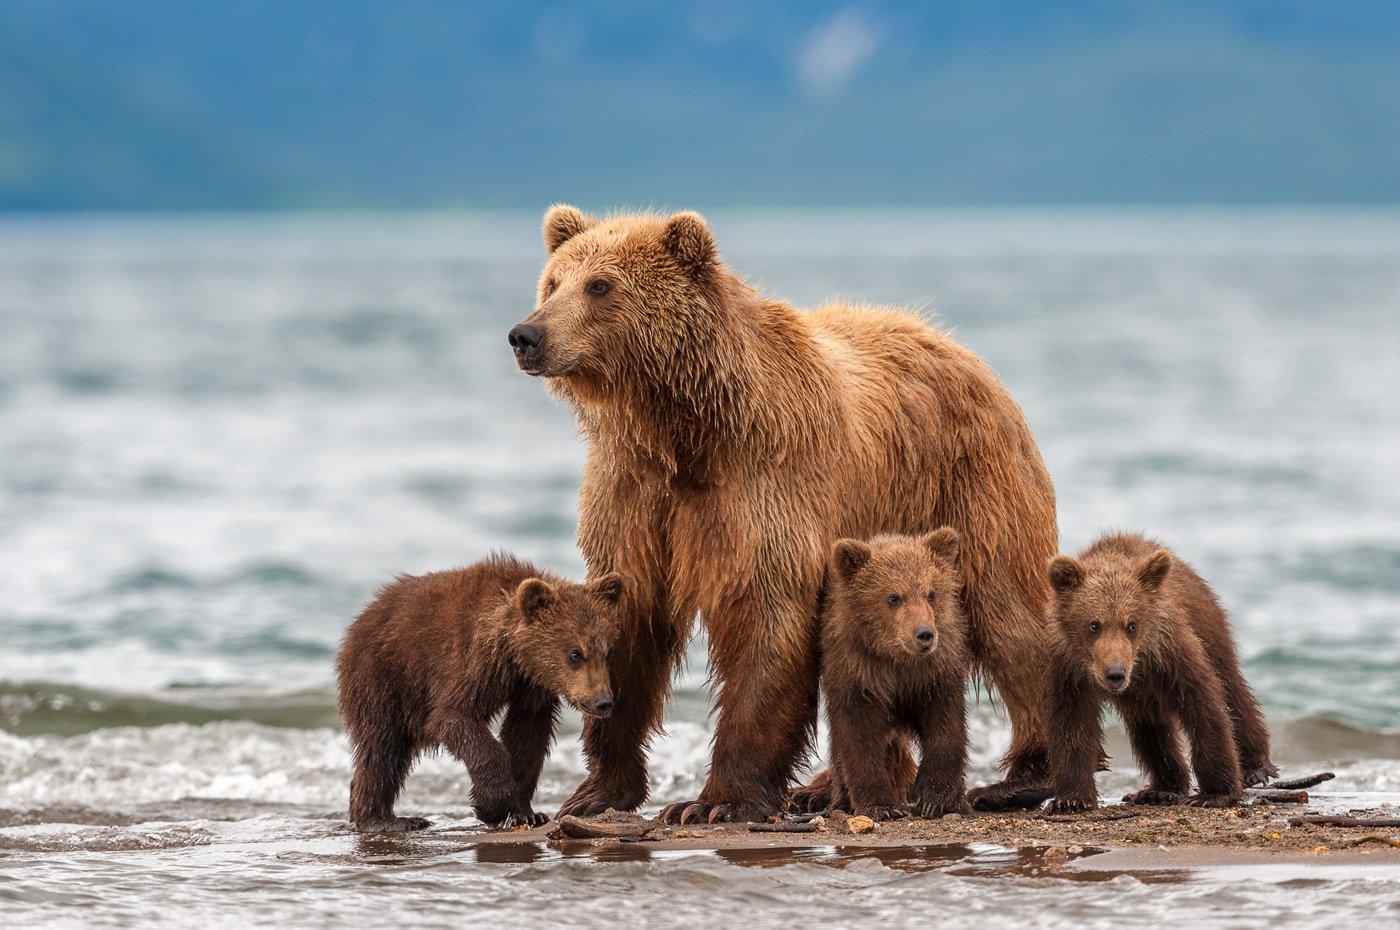 #bear #kamchatka #wildlife #wildlifephotography #wildnature #nikon #outdoors #animal #nature  #naturelovers #bearphoto  #cubs, Сергей Иванов